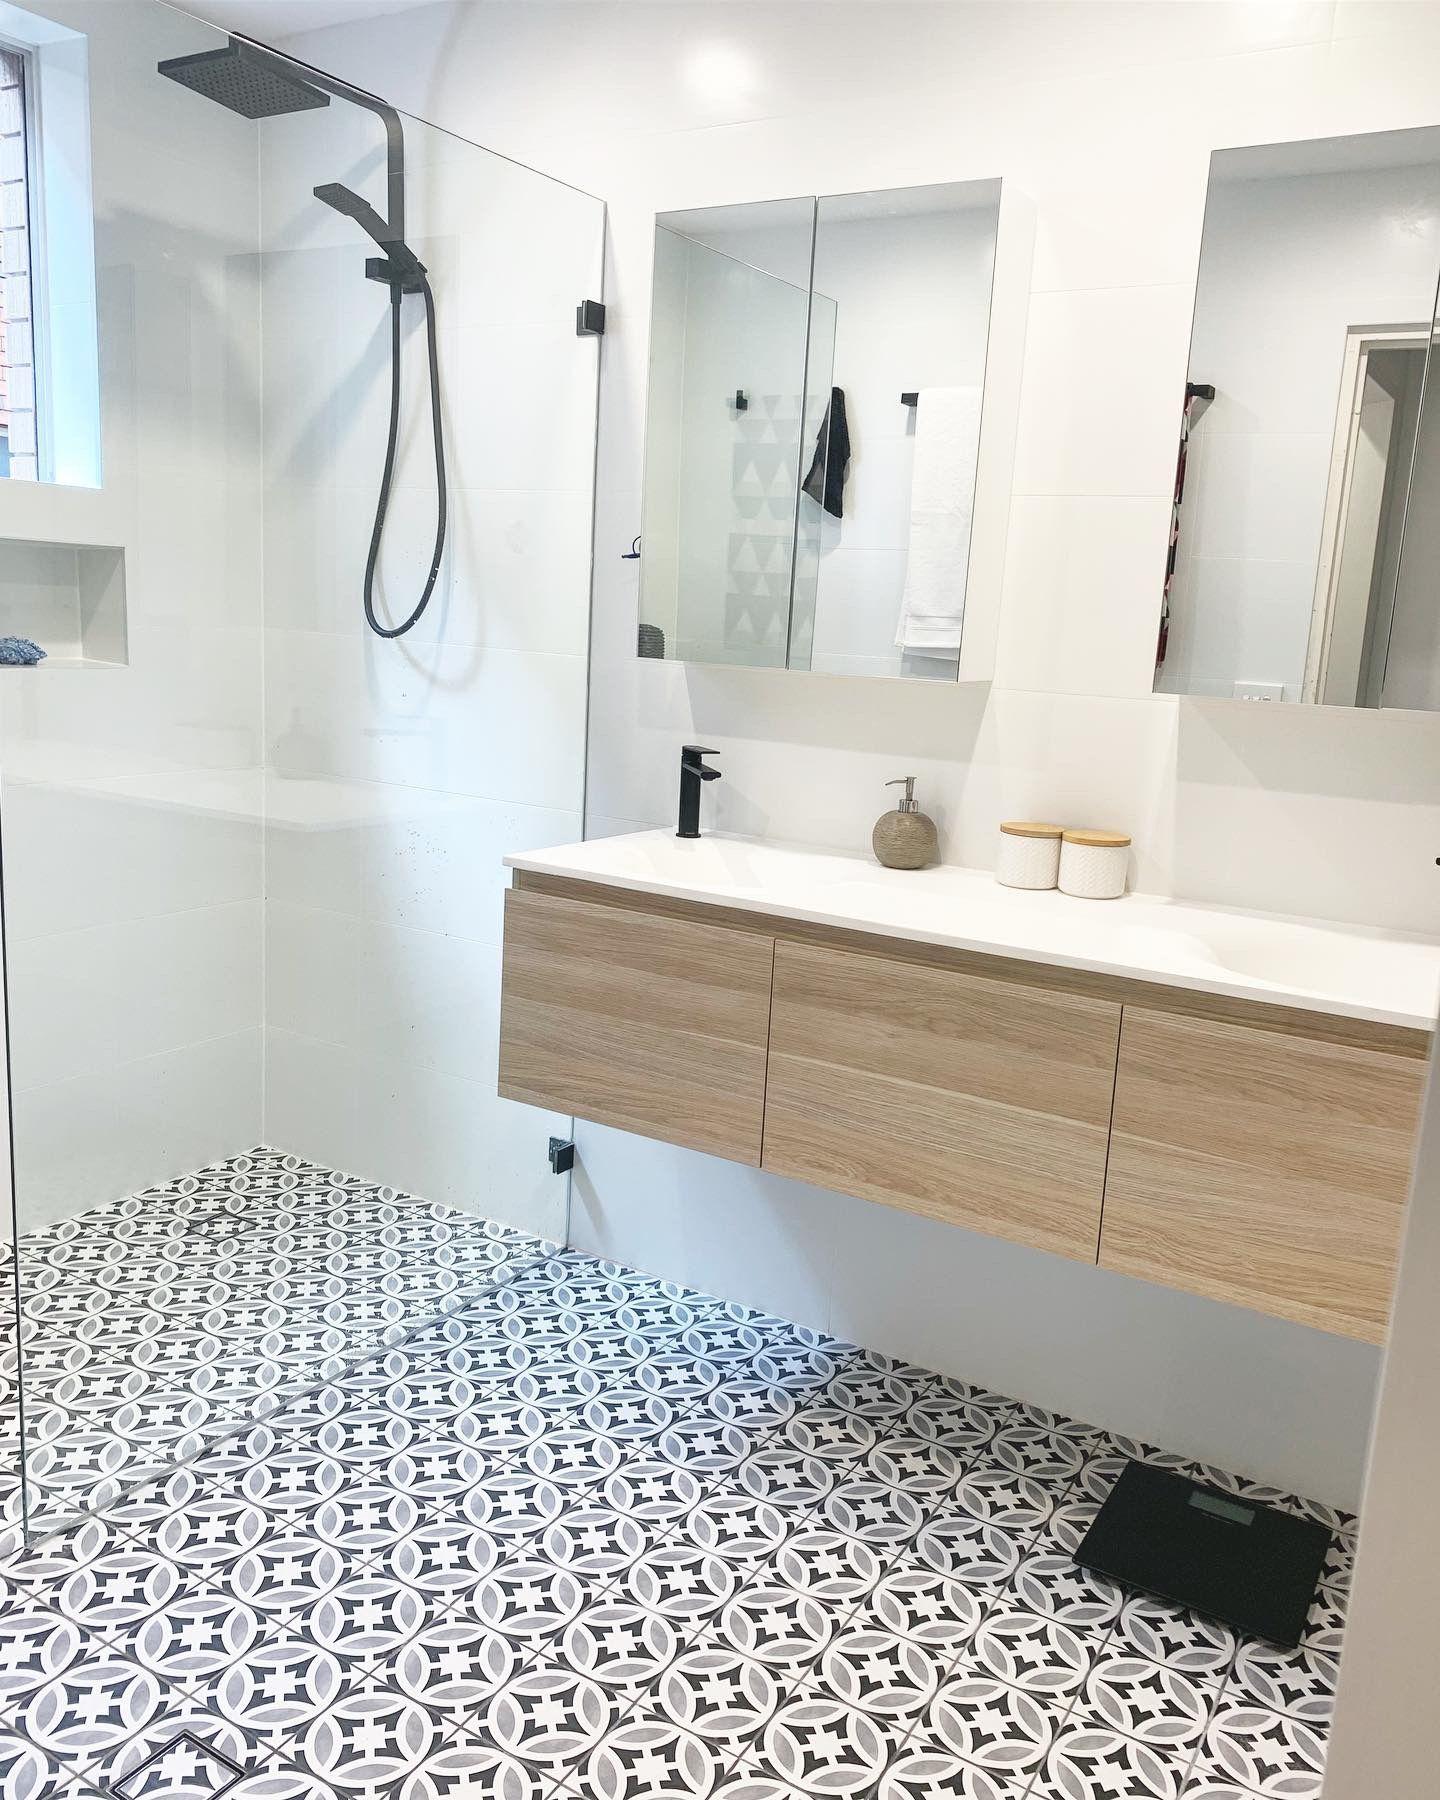 Recently Completed Bathroom Renovation In Sydney Very Nice Combination Designerbathroomvani Bathroom Layout Stylish Bathroom